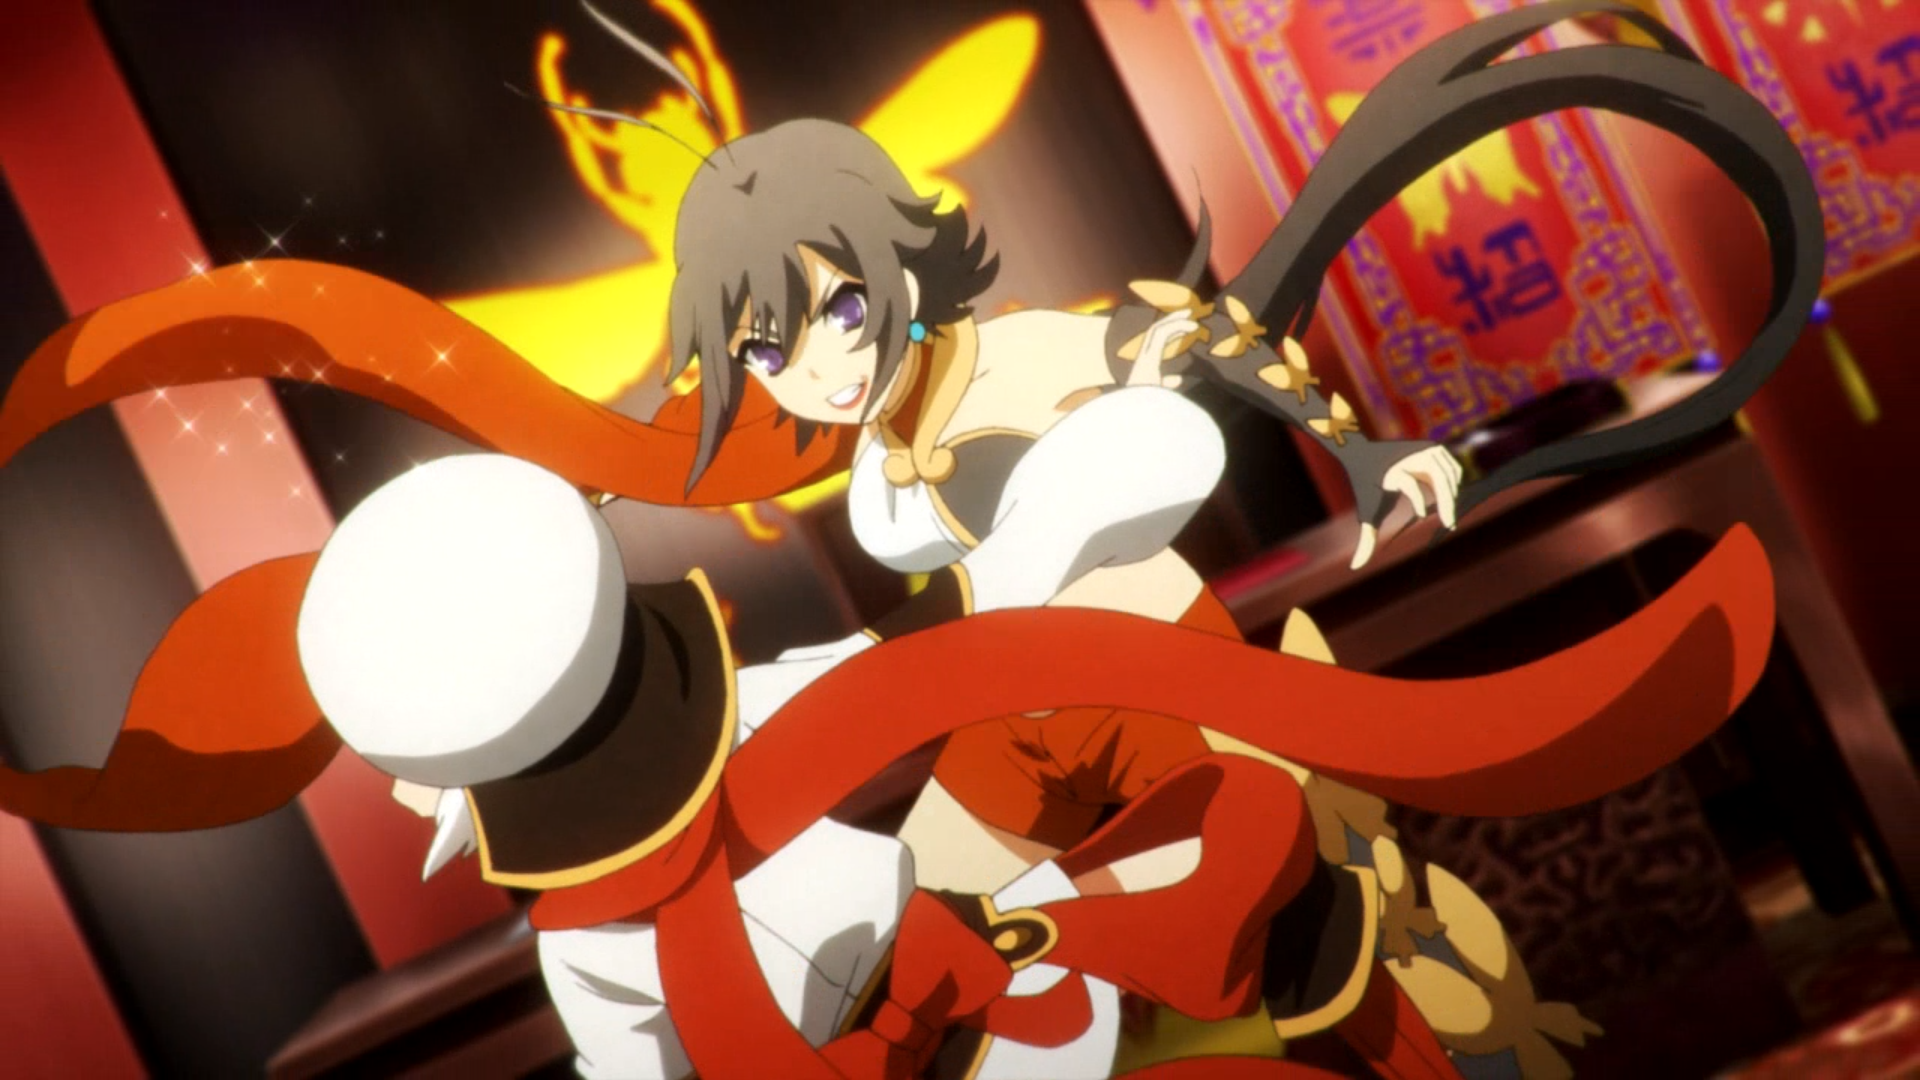 Chaos Dragon: Sekiryuu Seneki season 2 Release Date